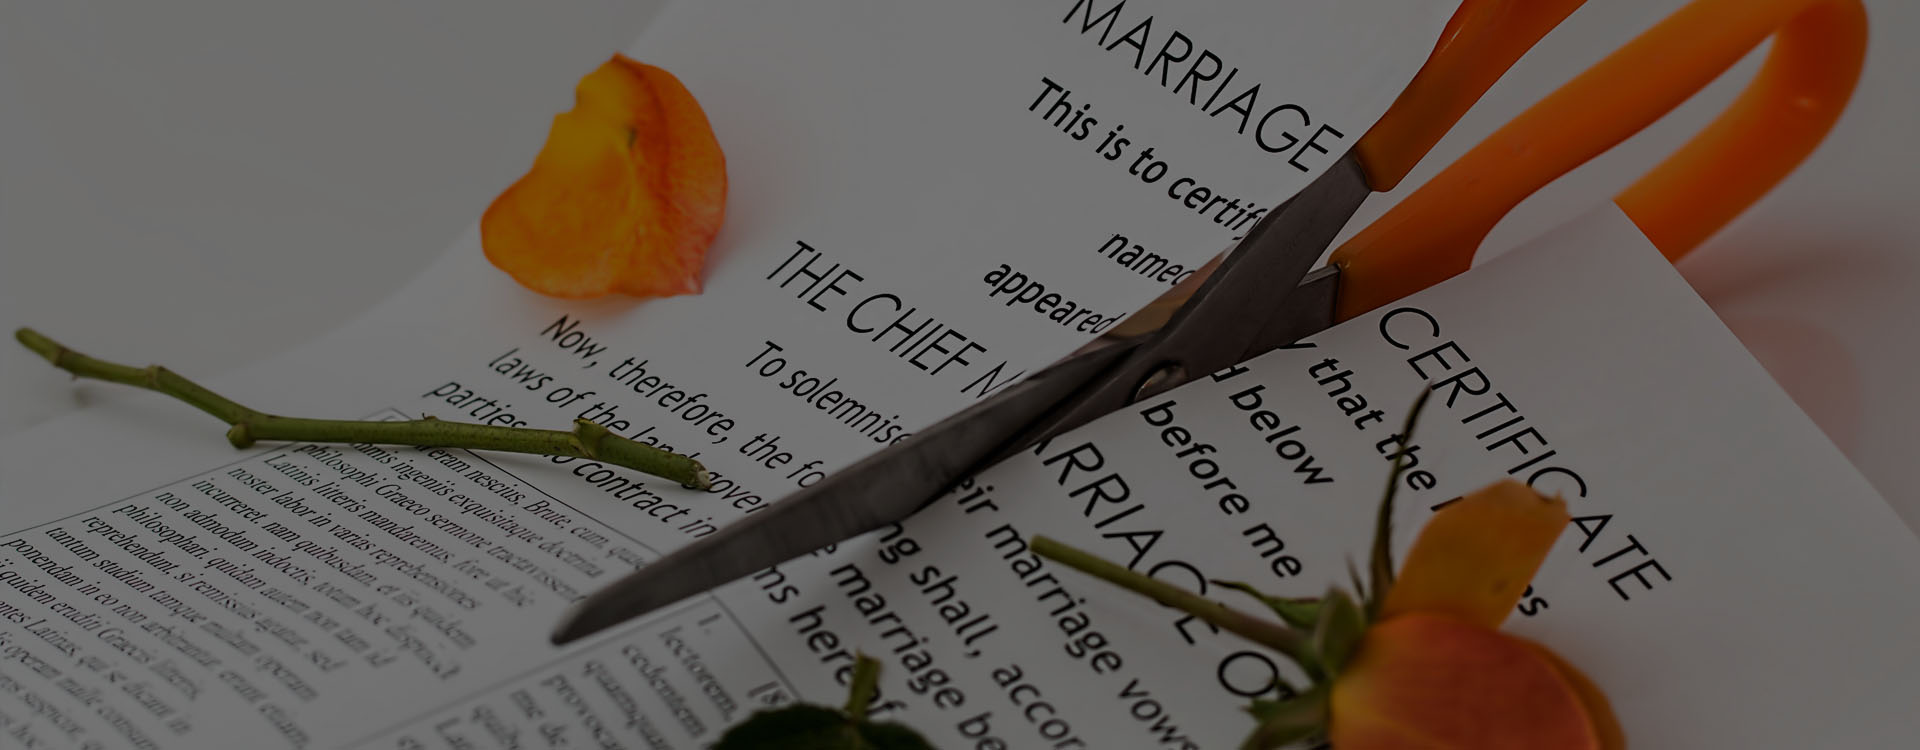 Northern Community Mediation Contemplating Divorce